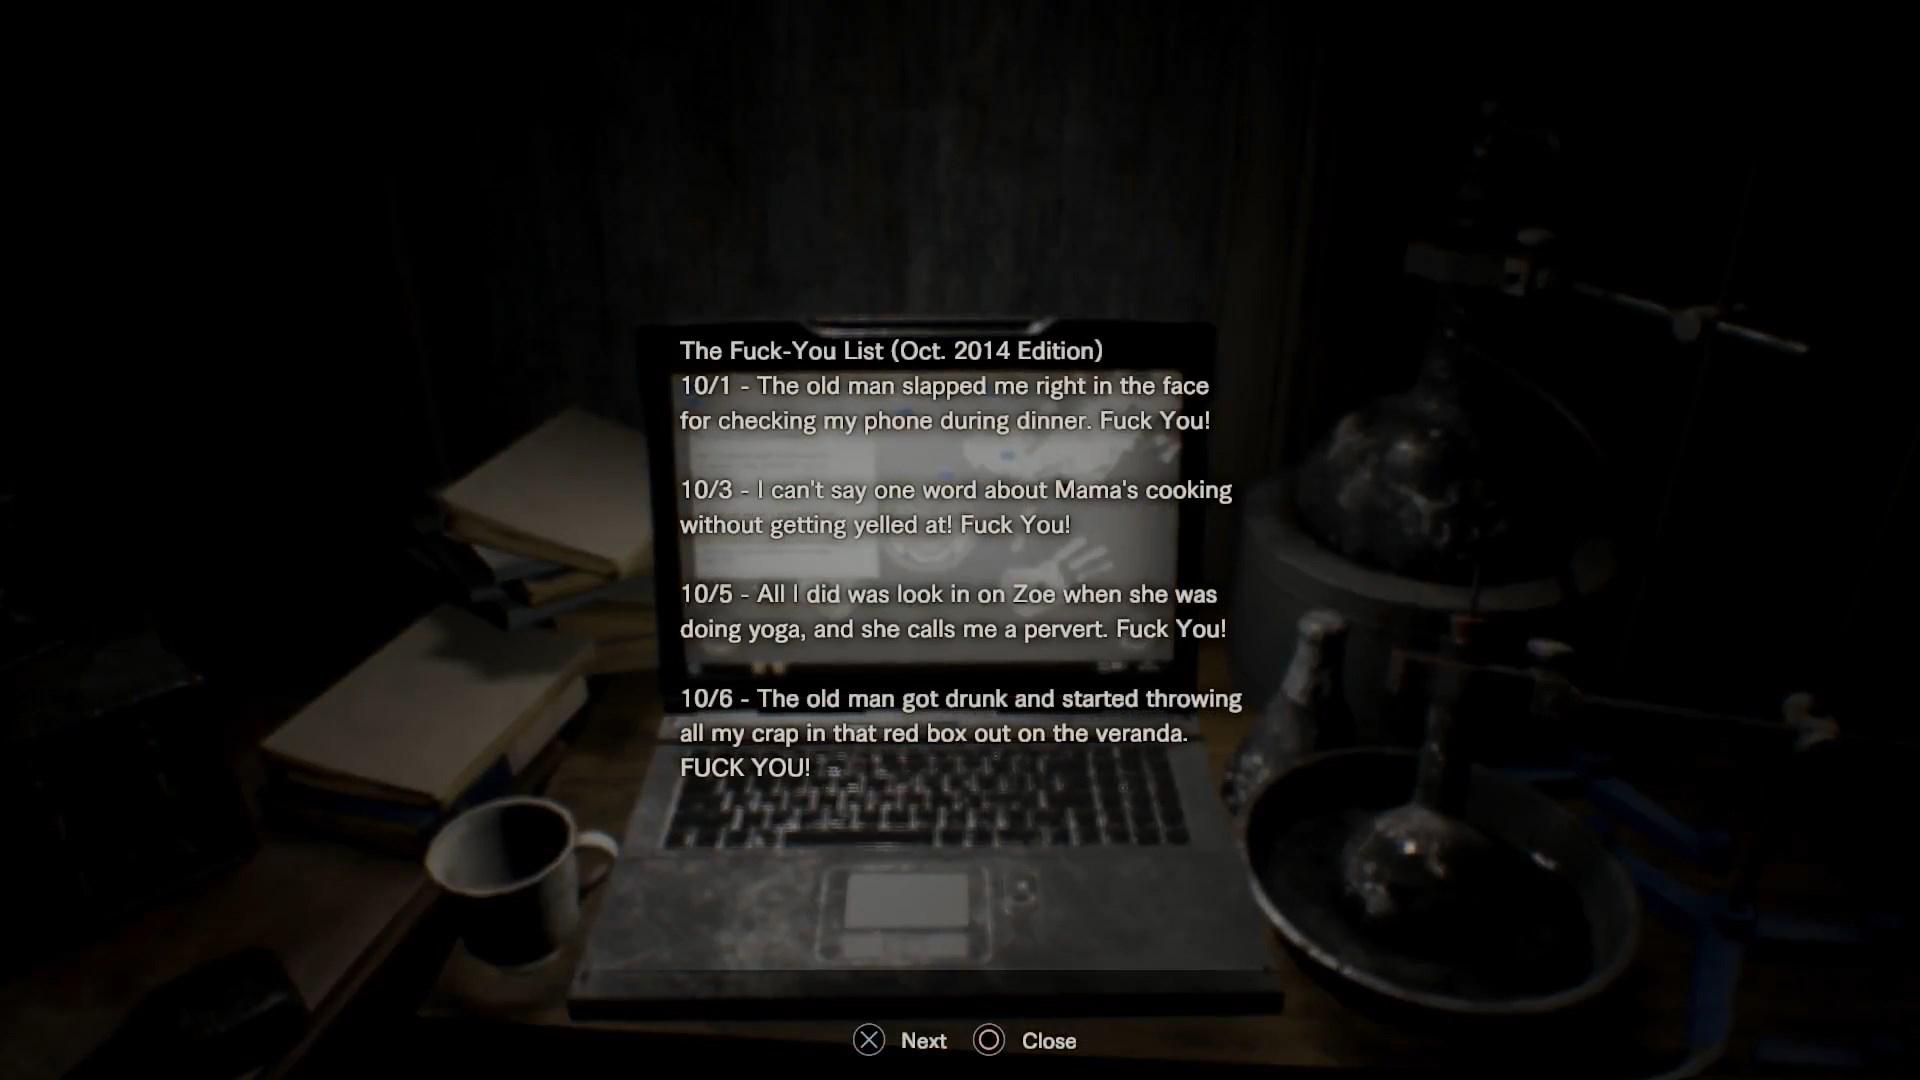 How to Get Resident Evil 7 Daughters True Ending | Shacknews